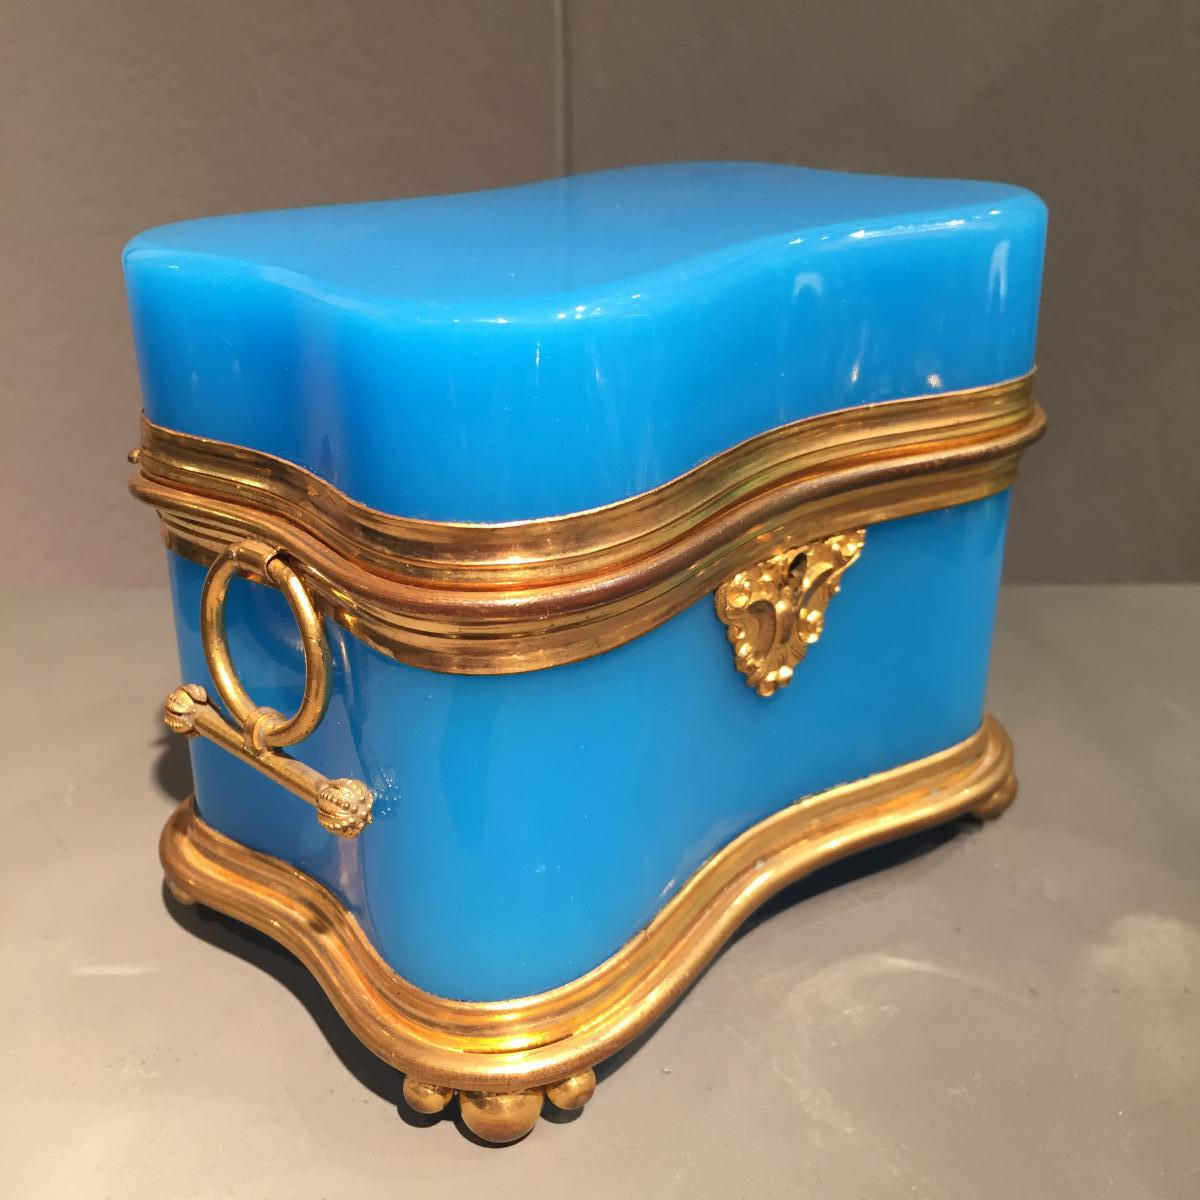 Coffret Opaline Bleu Milieu XIXeme époque Napoleon III.